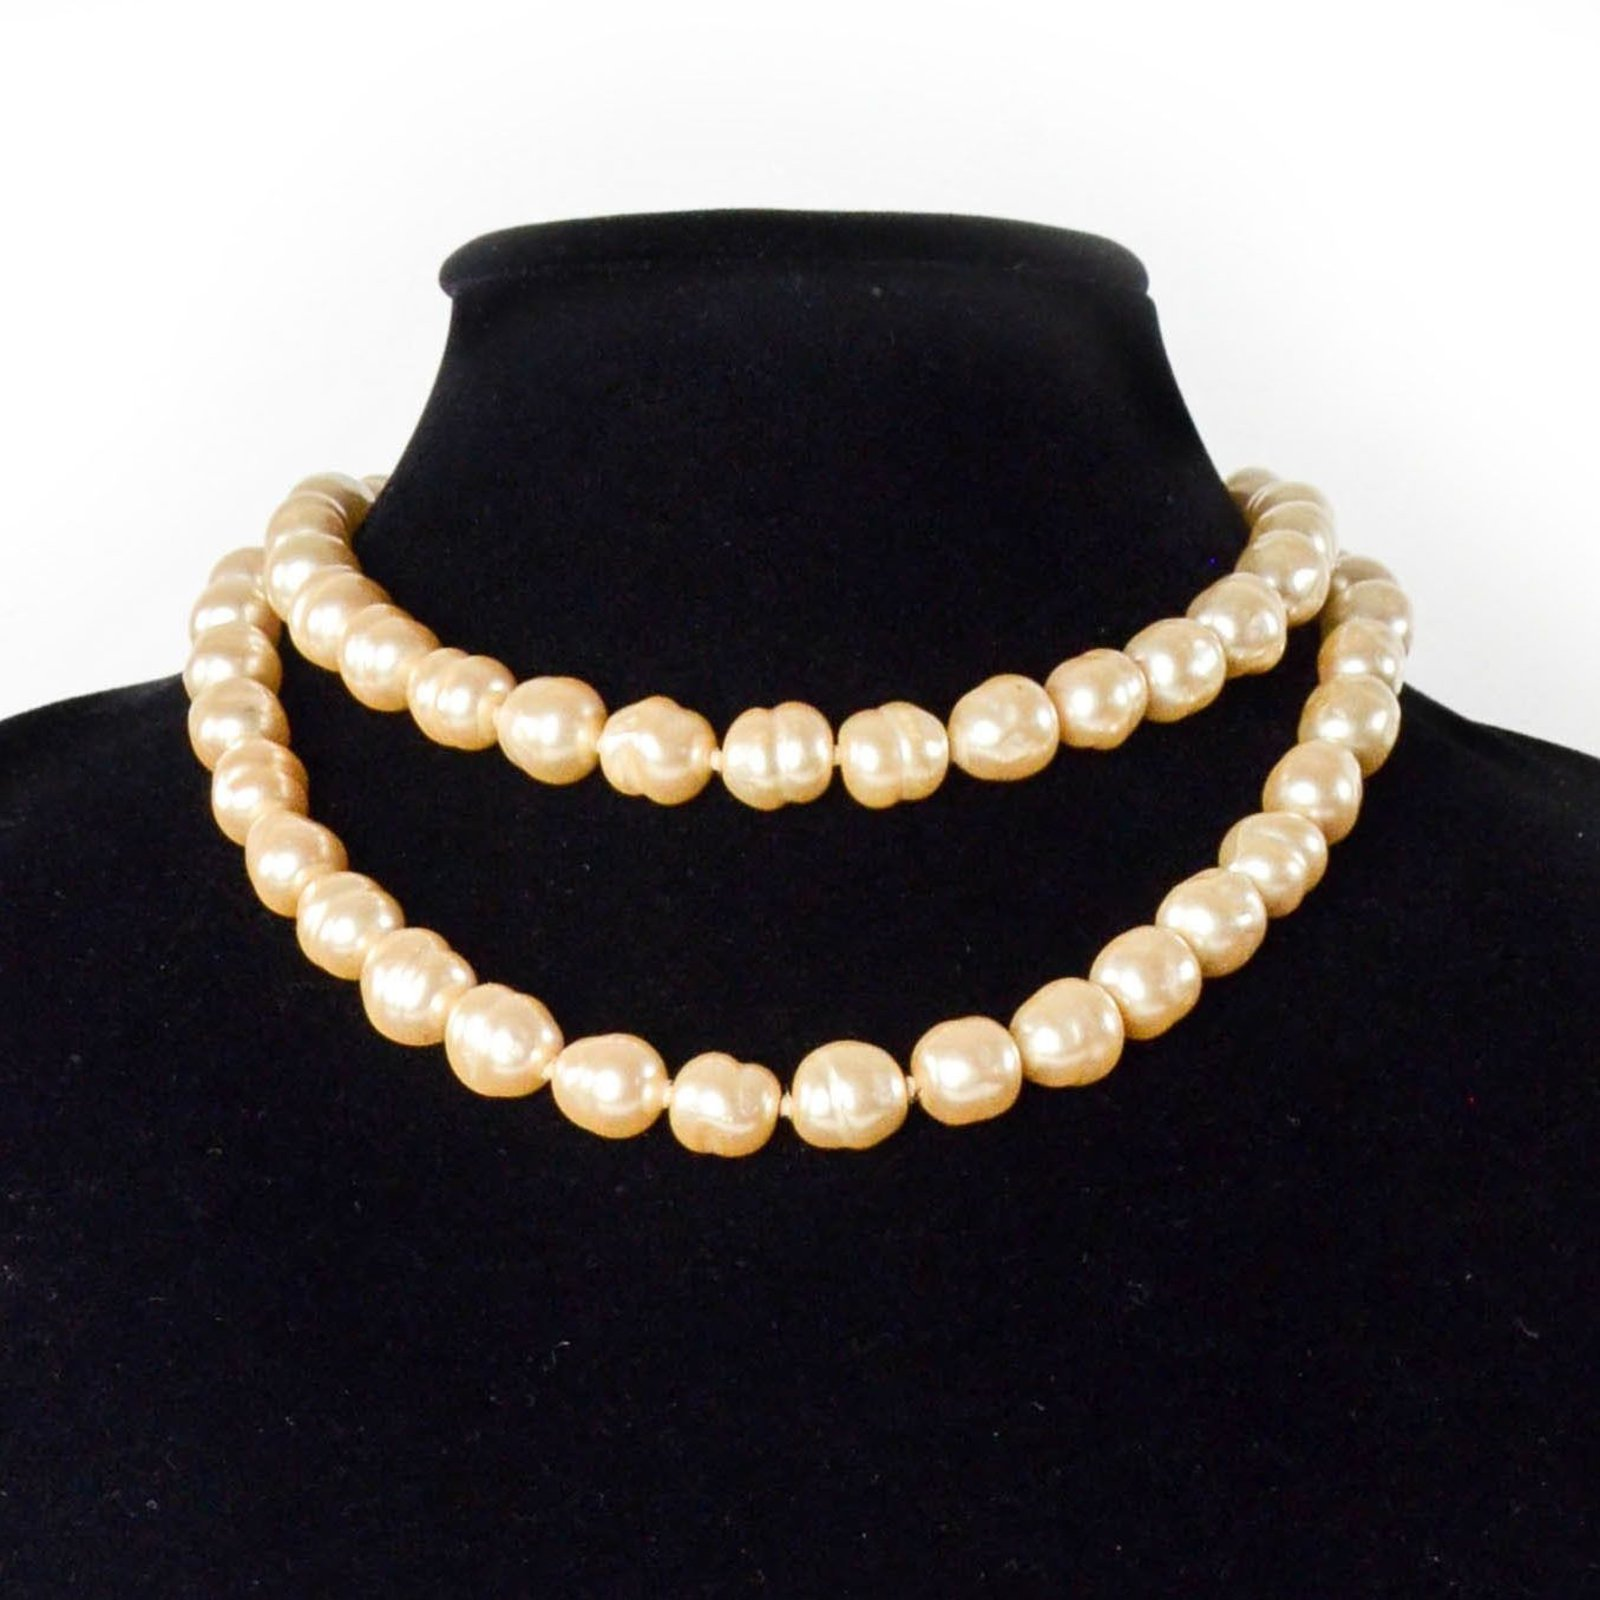 64668dde7e1 Facebook · Pin This. Colliers Chanel Collier de perles Vintage Perle Blanc  ...